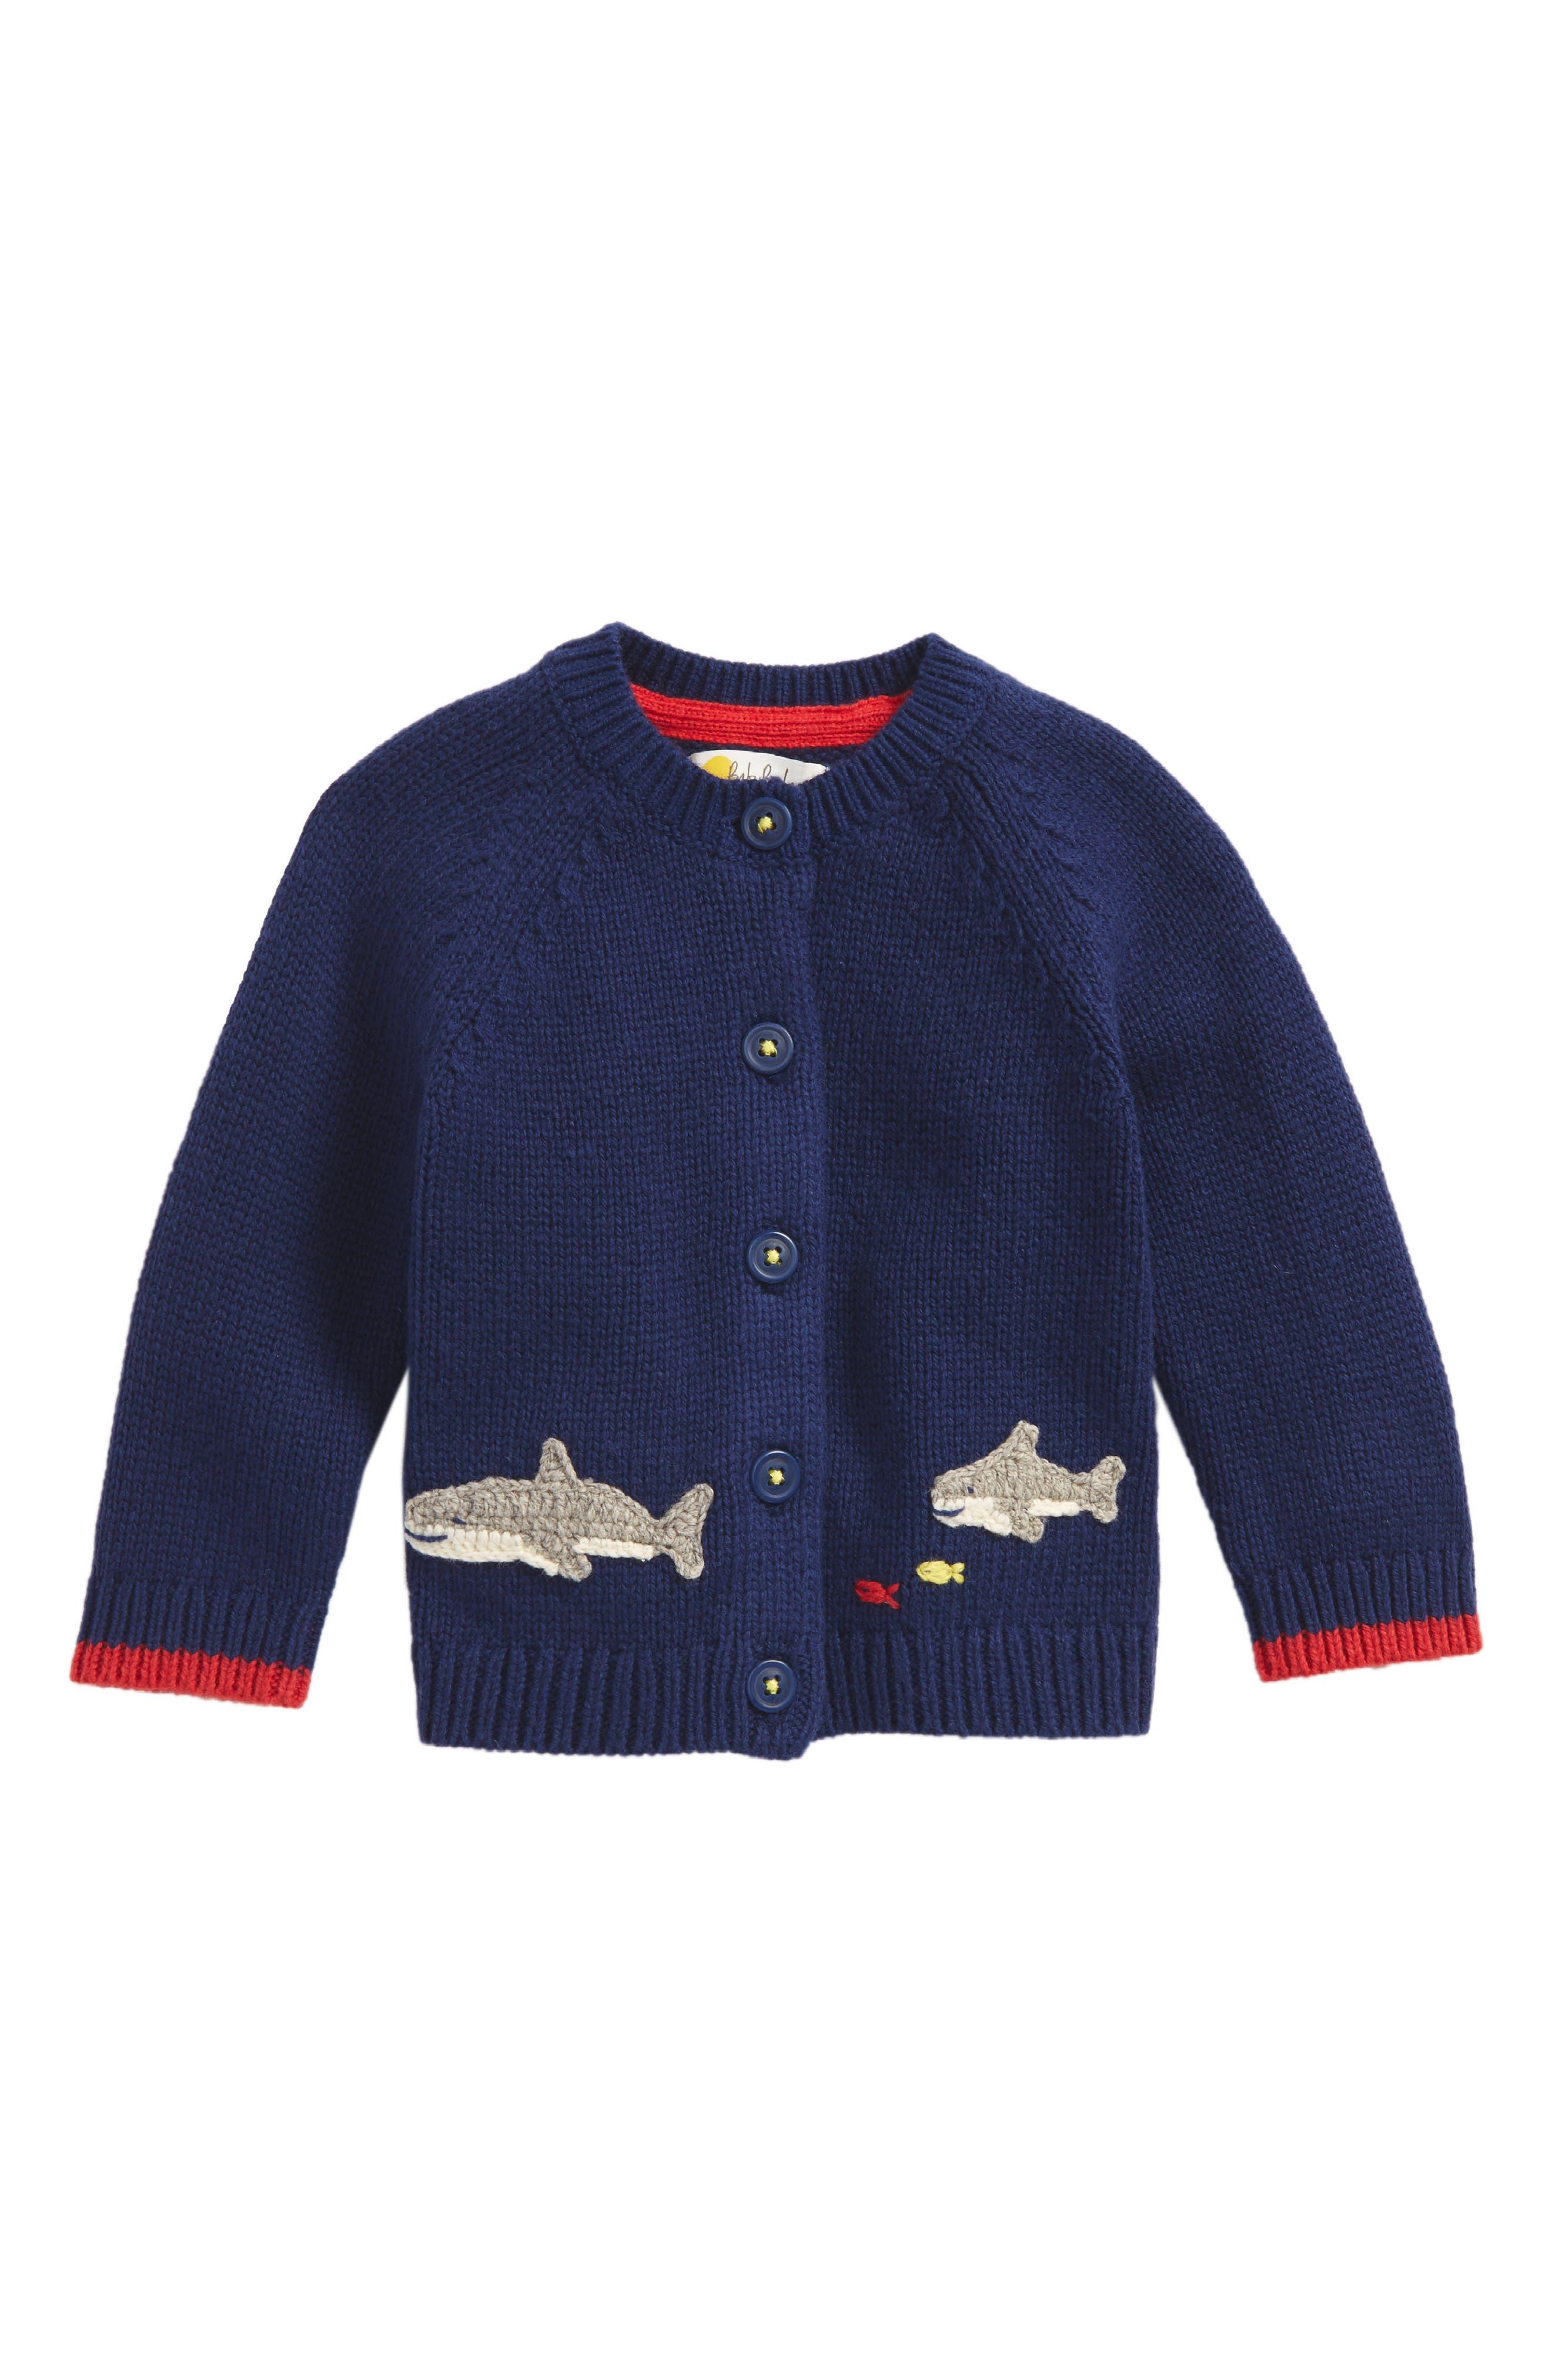 Sea Creature Sweater Cardigan,                             Main thumbnail 1, color,                             Beacon Blue Sharks